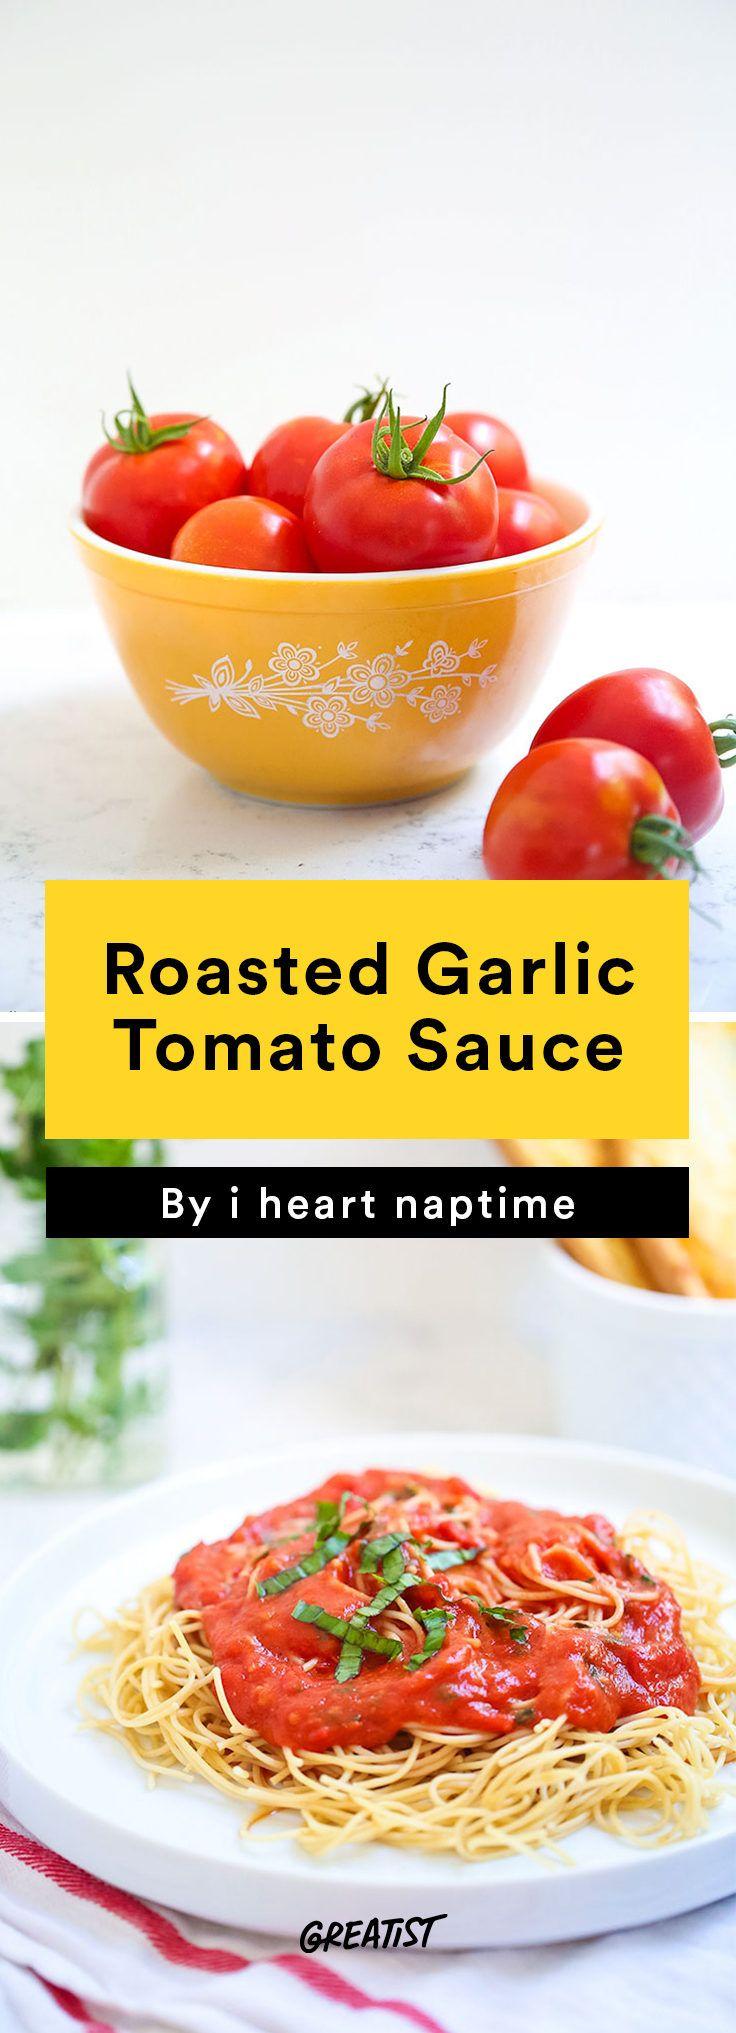 3. Roasted Garlic Tomato Sauce #greatist http://greatist.com/eat/homemade-tomato-sauce-recipes